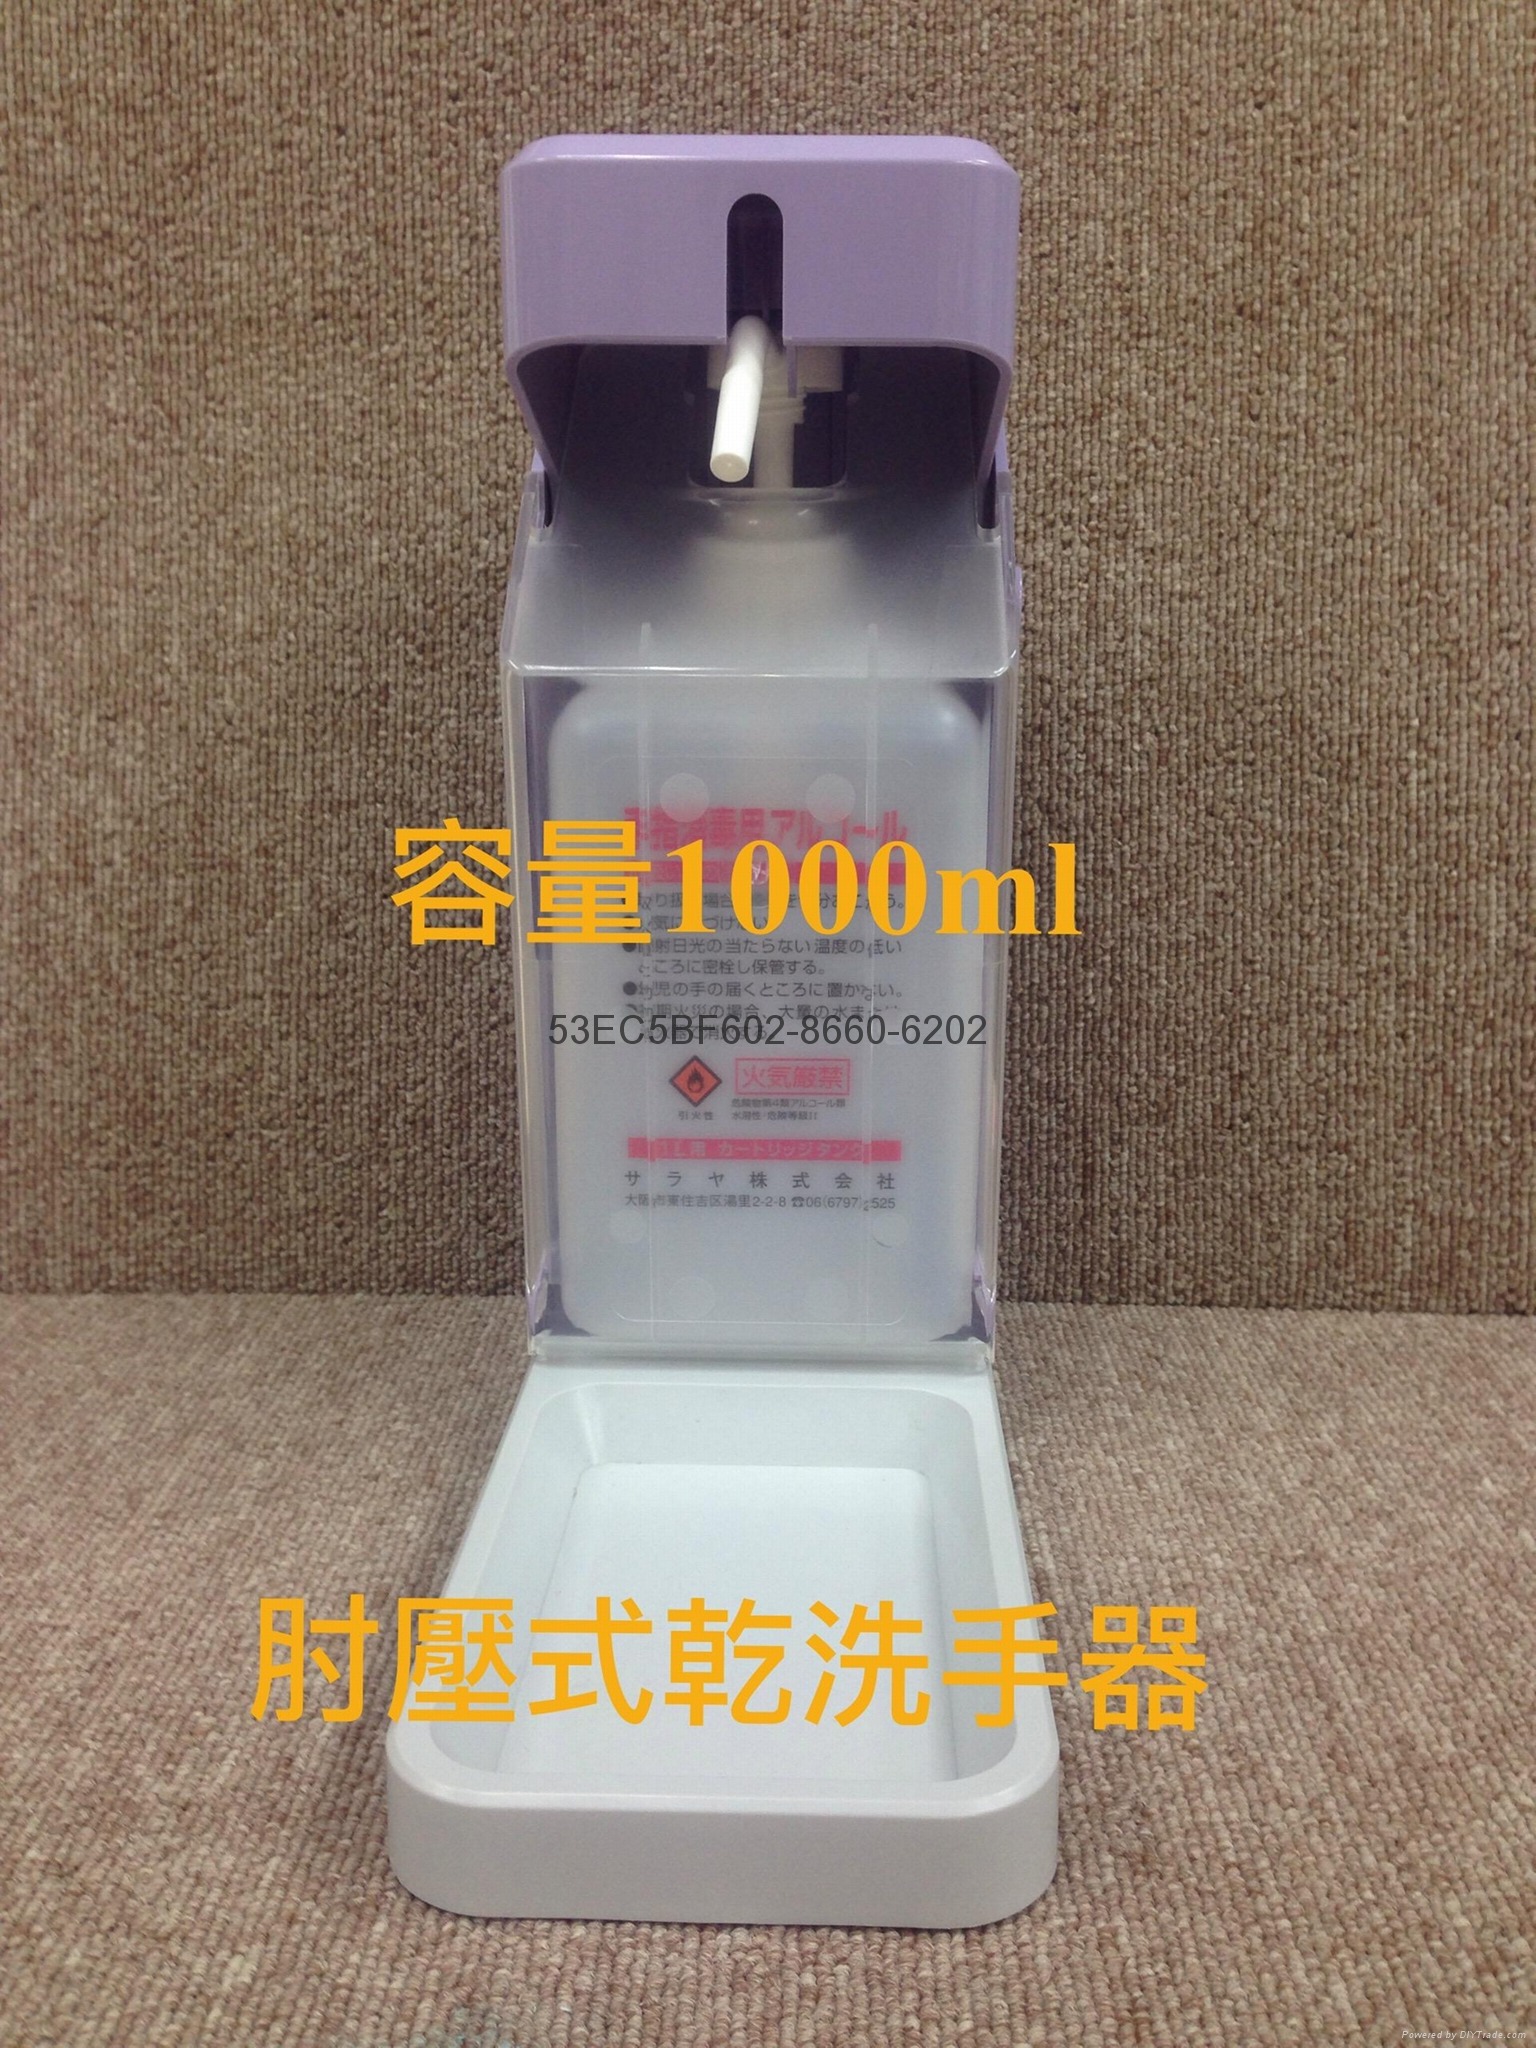 Manual Spray Device 1